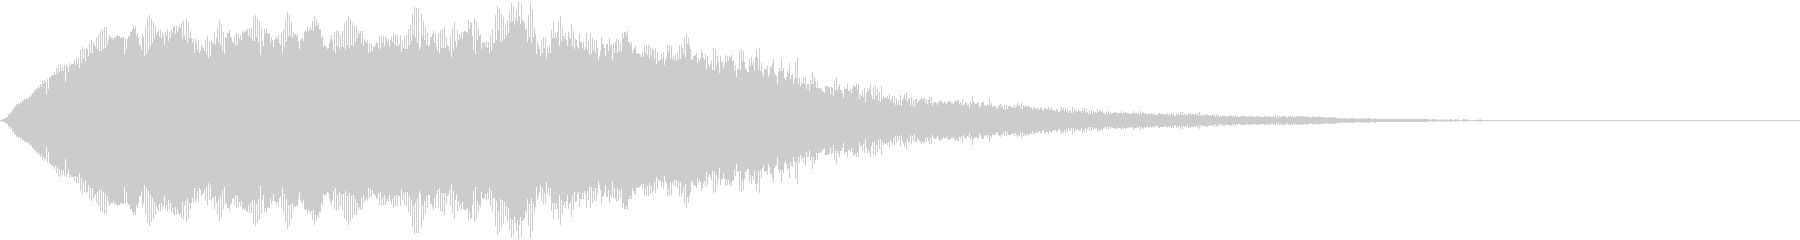 SFX ケミカルな昭和特撮風パッド 4の未再生の波形